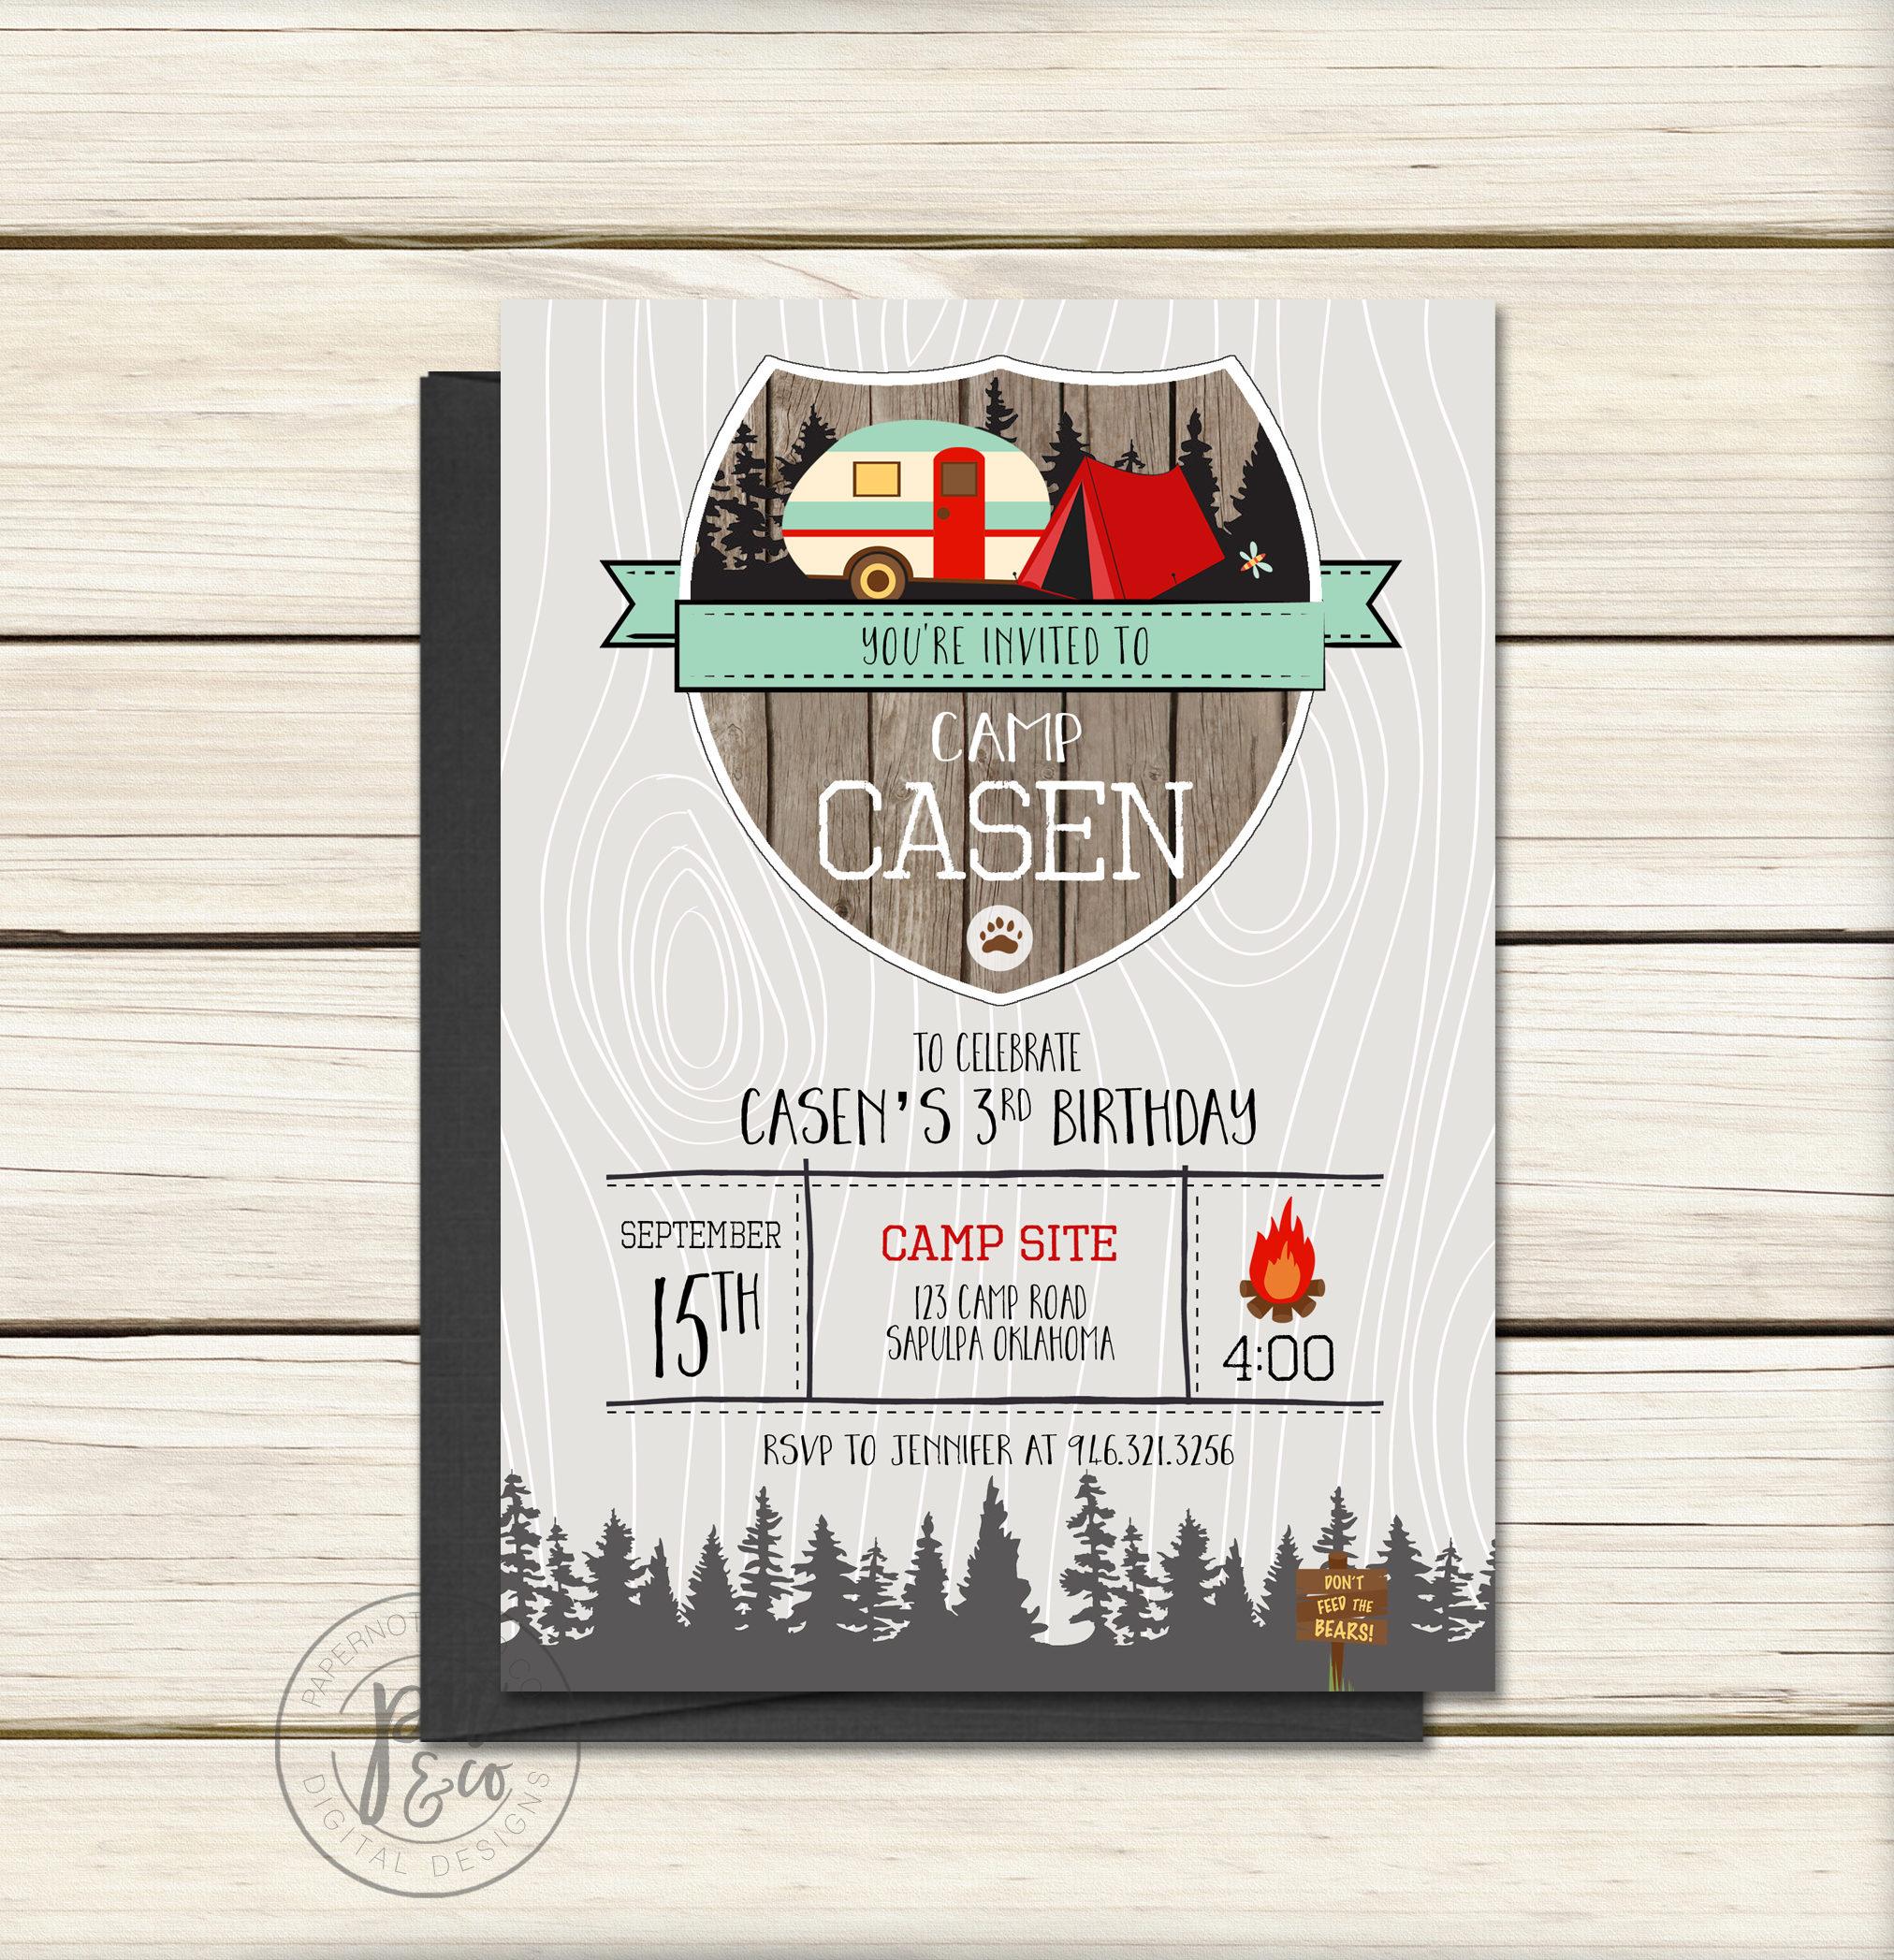 Camping Birthday Party Invitation // Camp Party // Camp Invitation ...